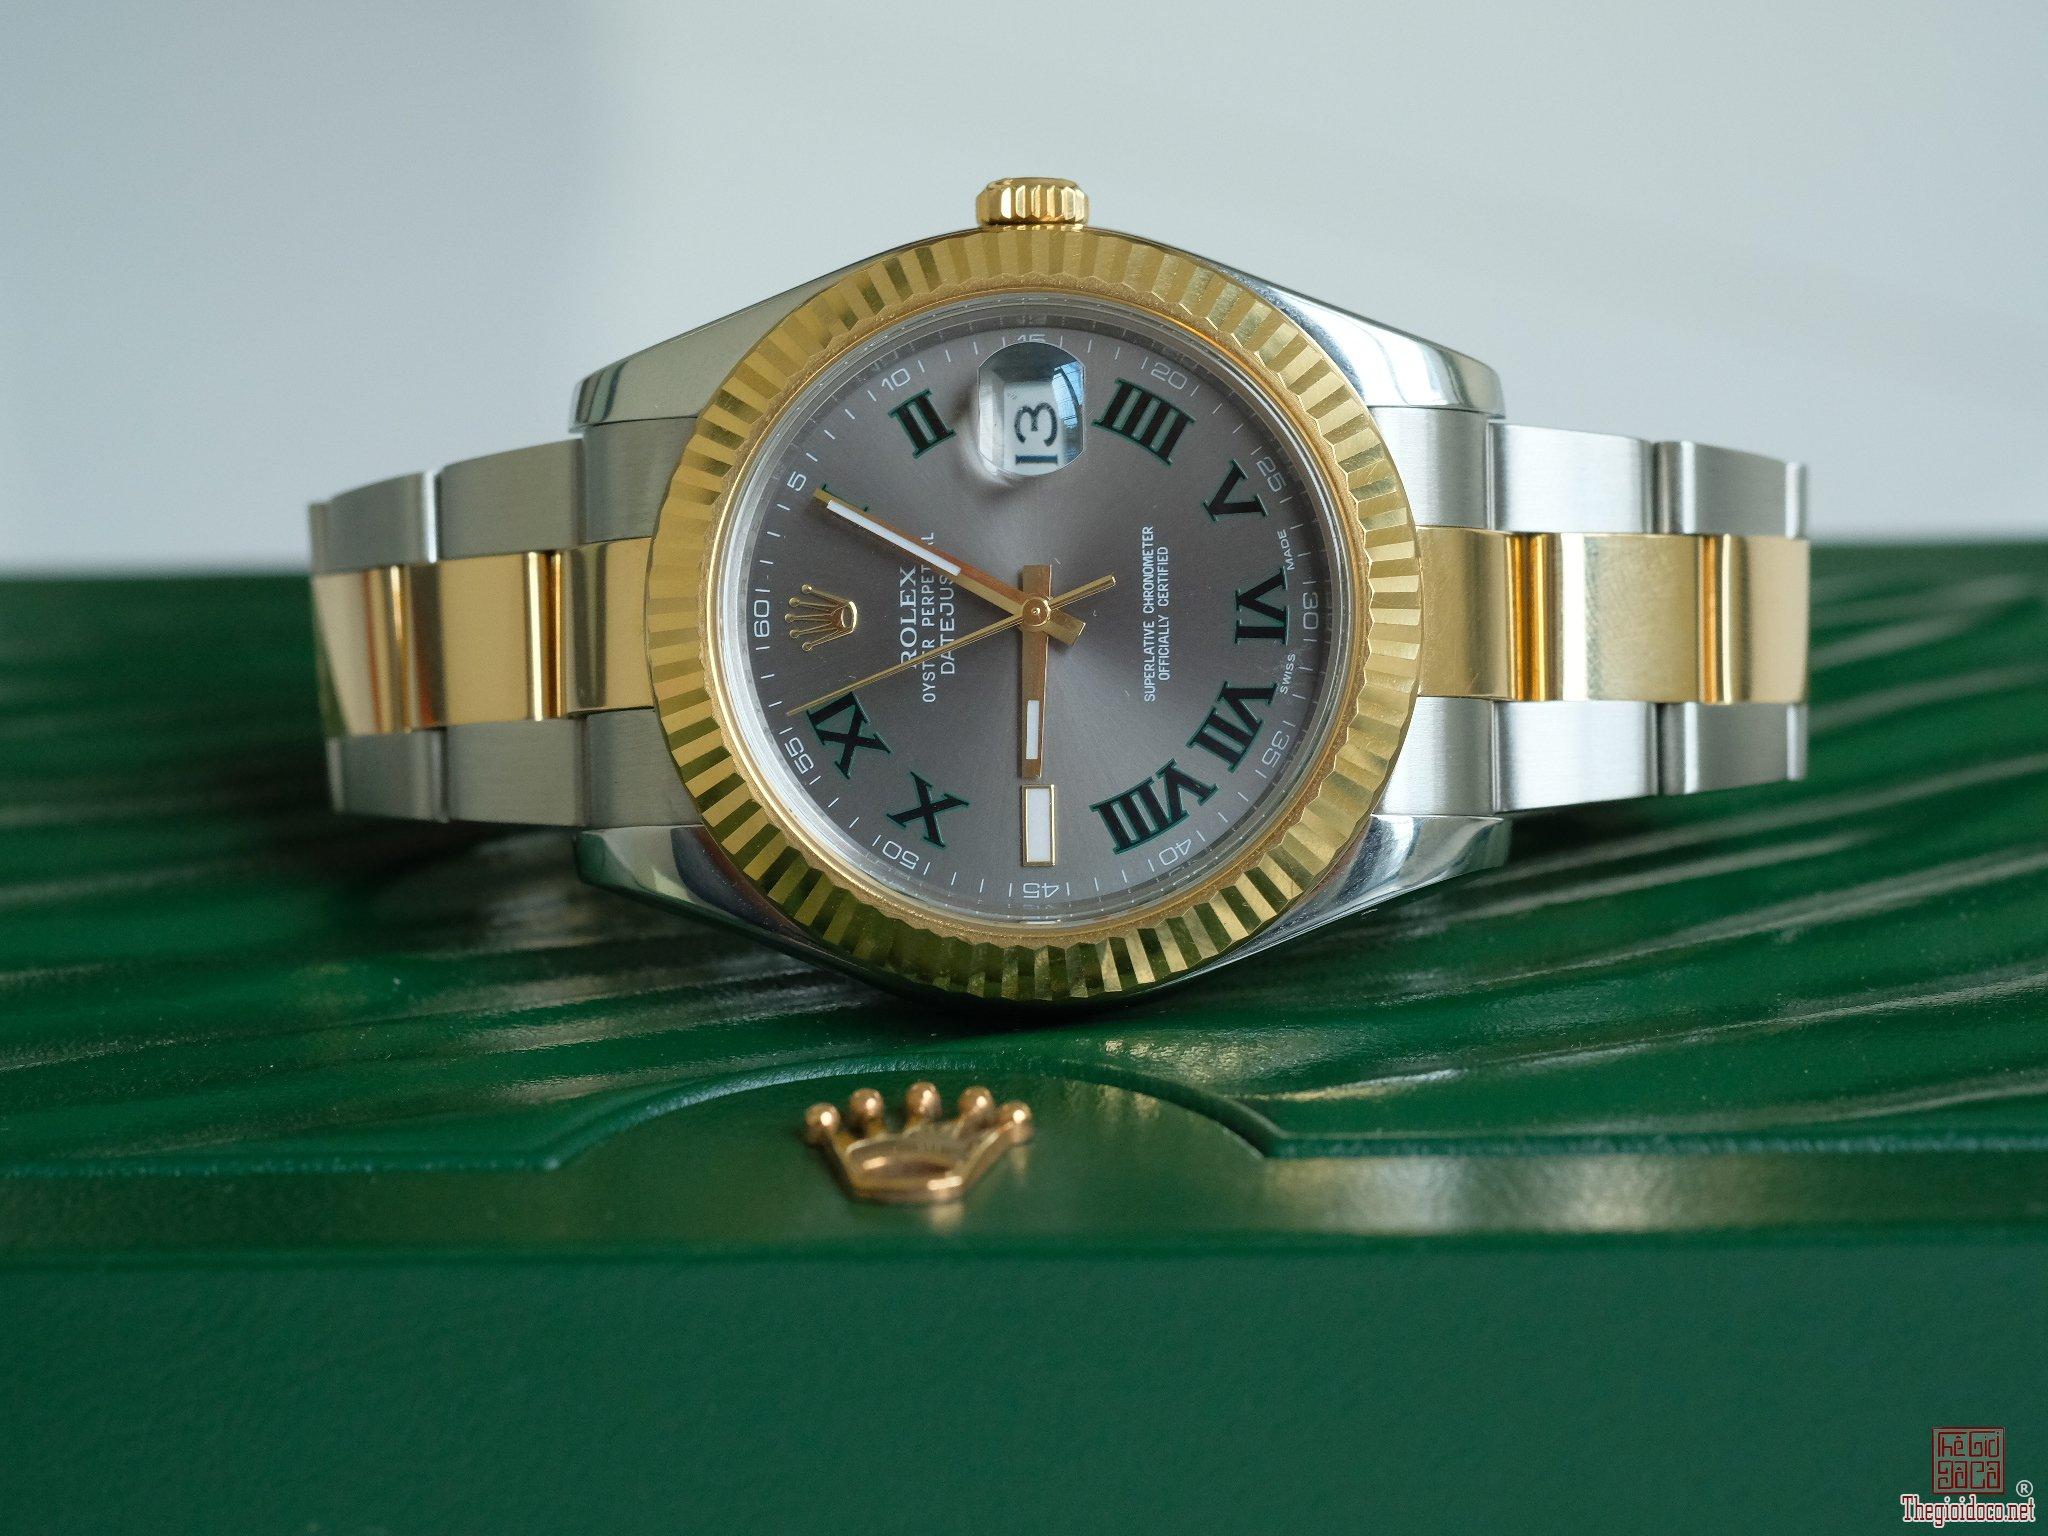 Đồng hồ Rolex Date just 116333 Demi vàng 18k Mặt số Wimbledon size 41